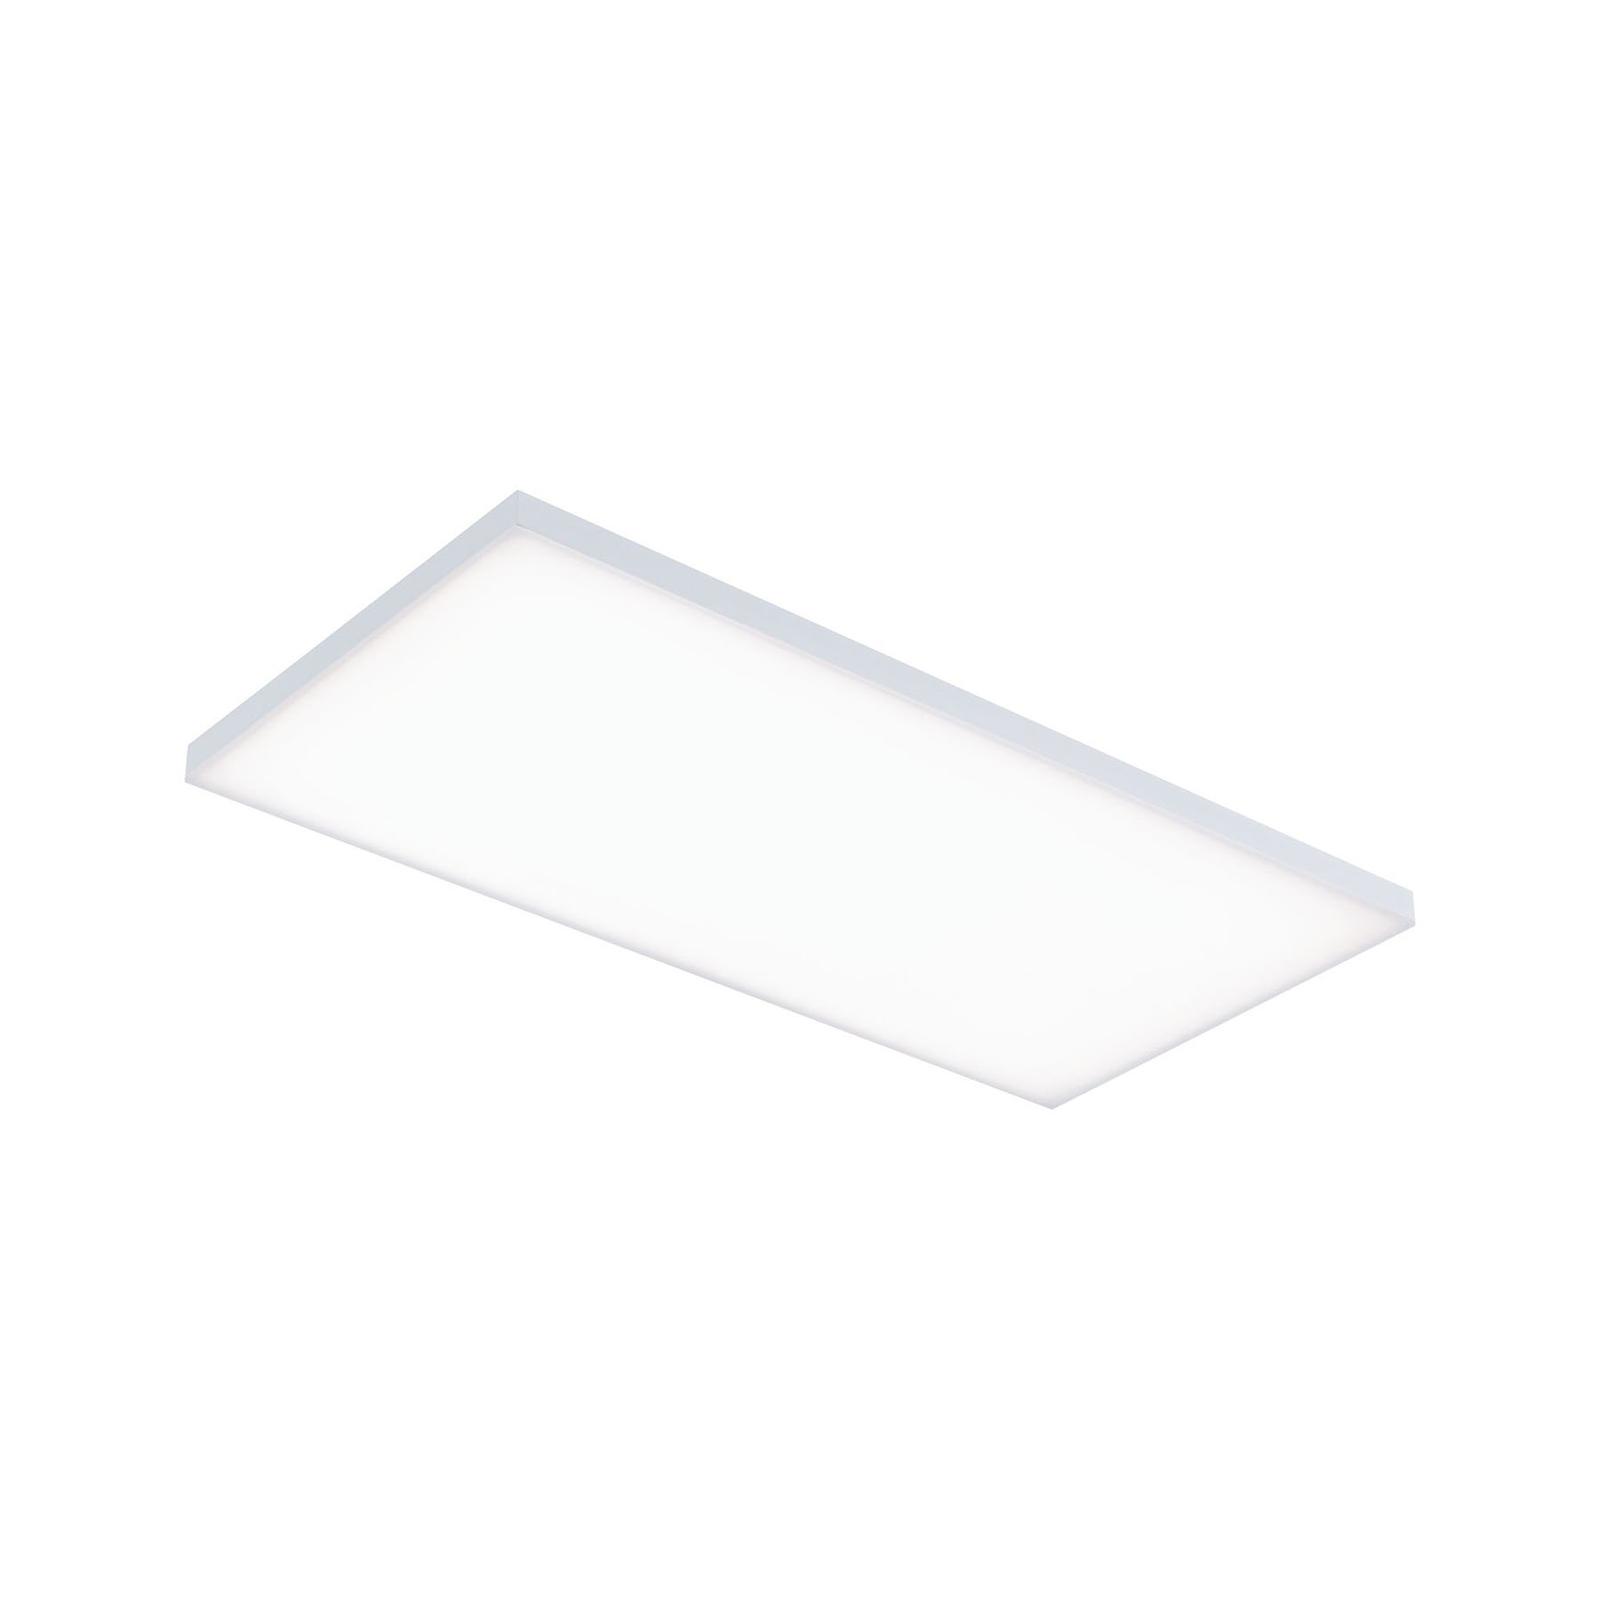 Paulmann Velora LED-Panel 3-step-dim, 59,5x29,5 cm